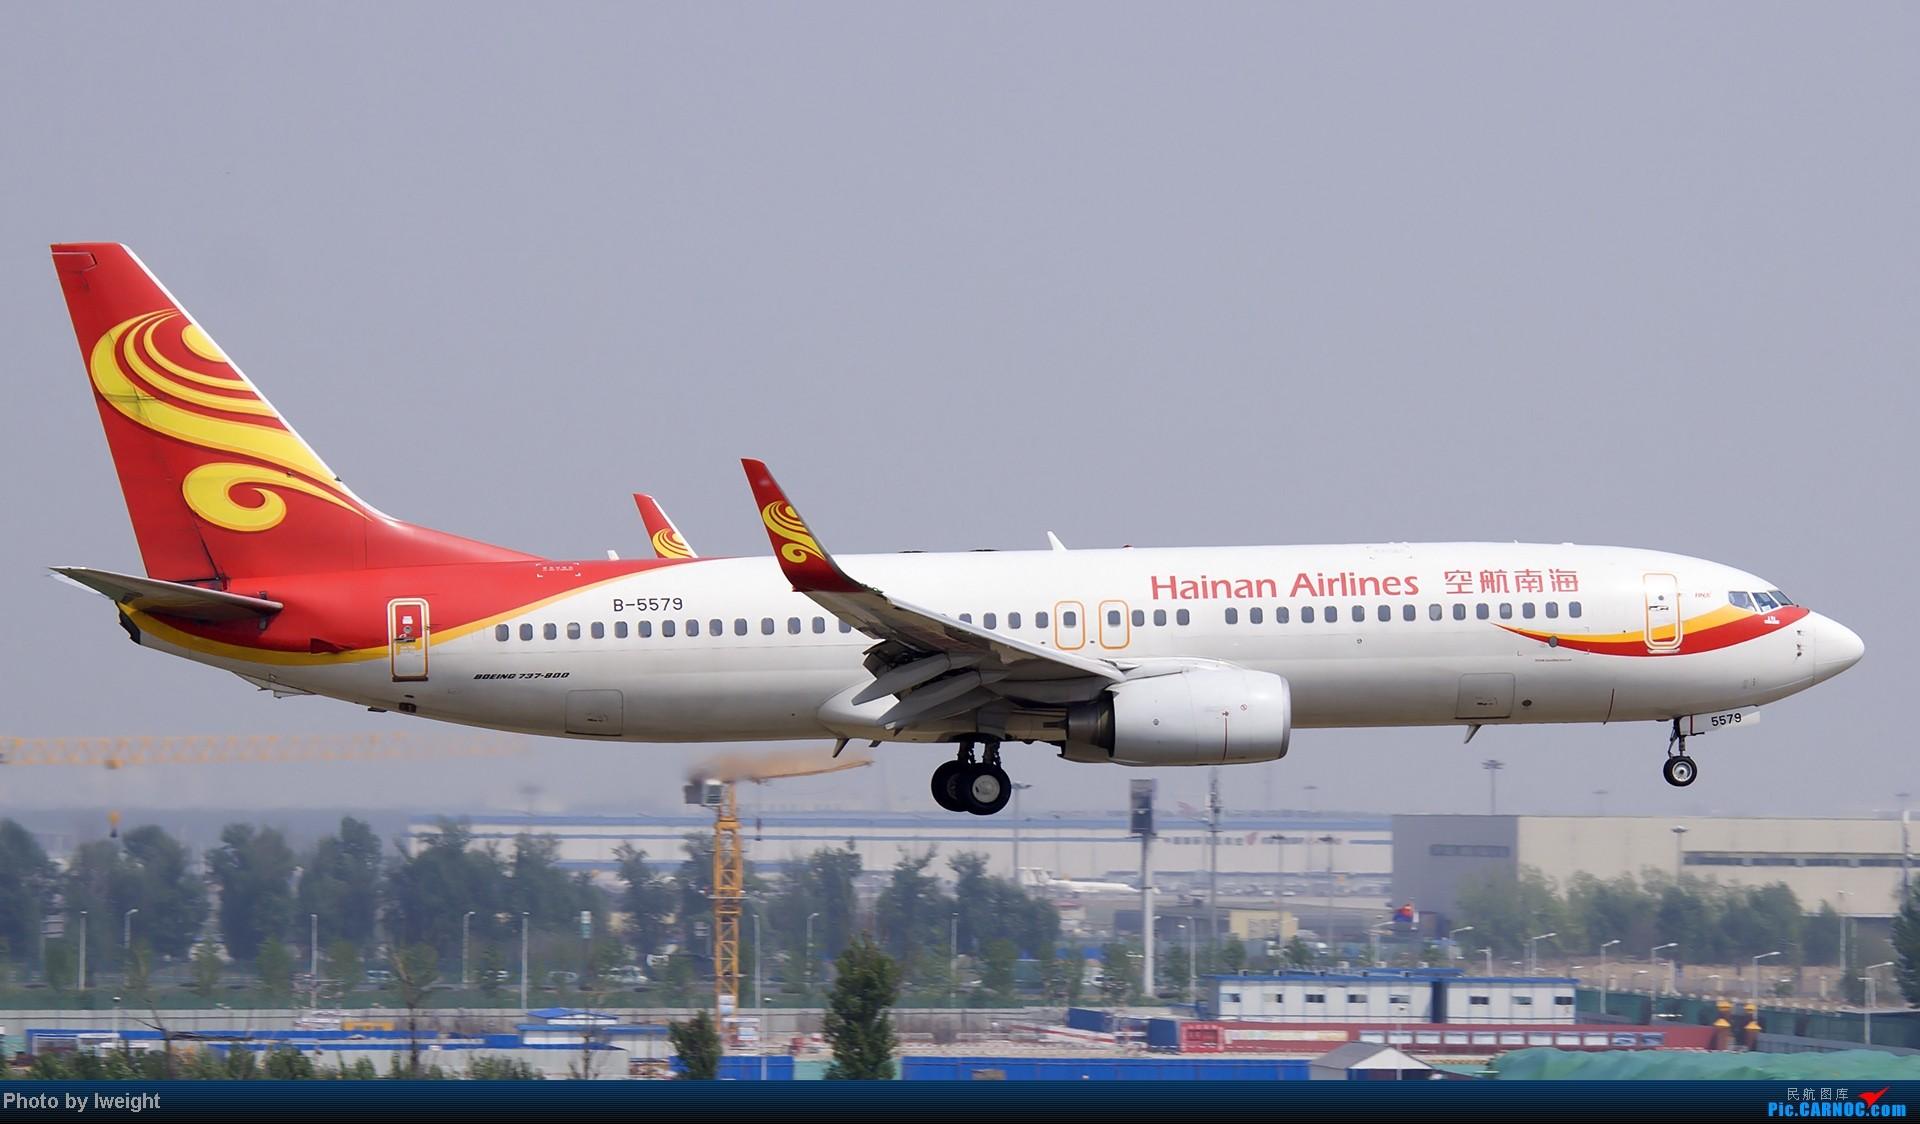 Re:[原创]错过了卡航的巴塞罗那号,只有这些大路货了,泪奔啊 BOEING 737-800 B-5579 中国北京首都机场